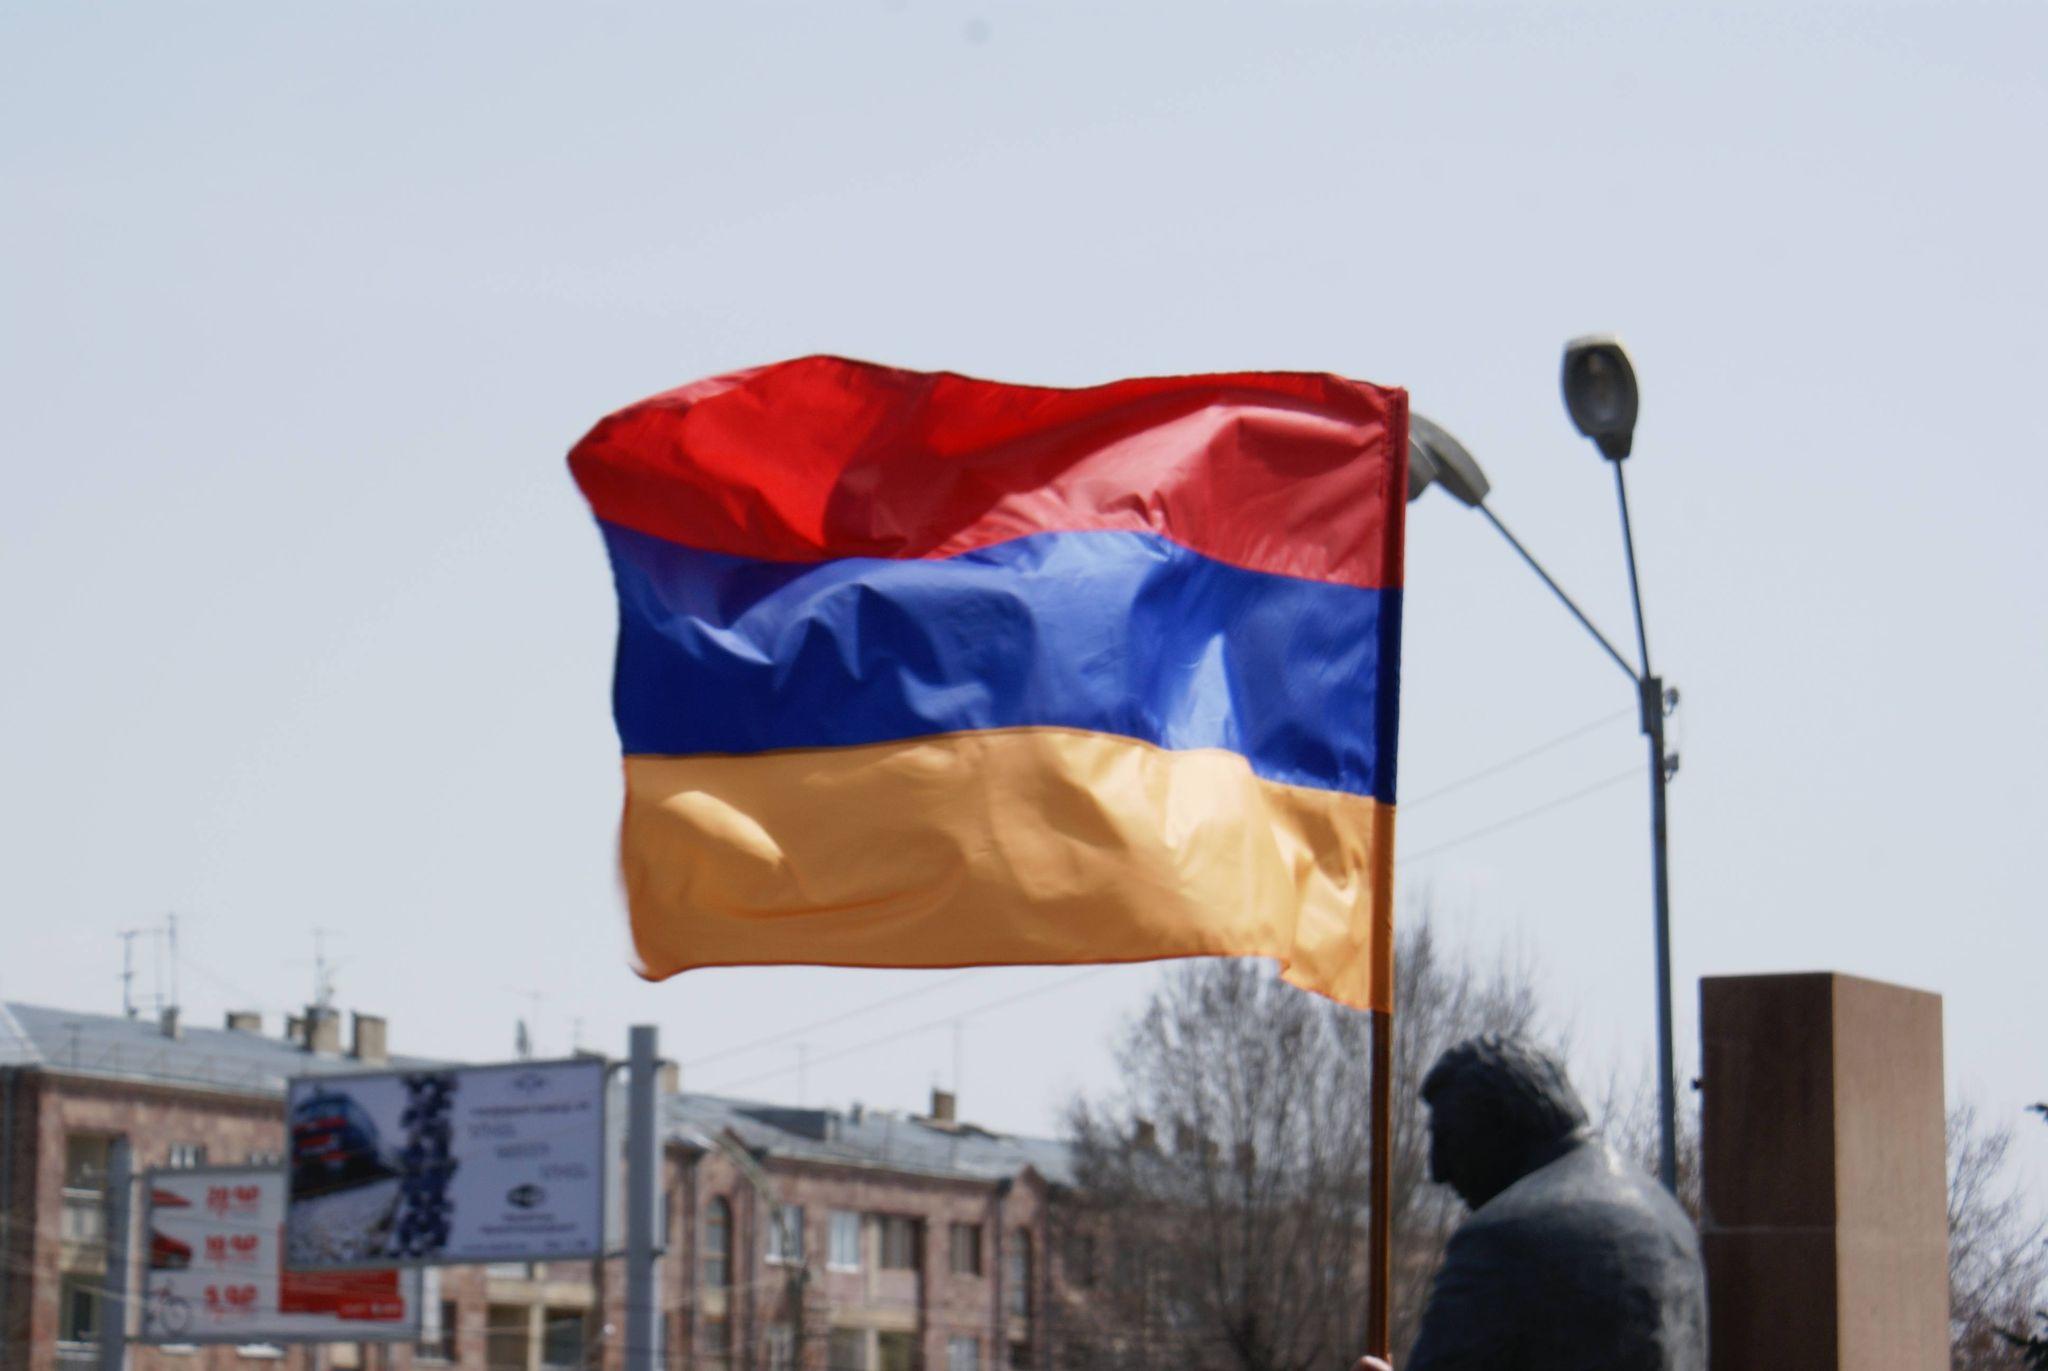 Photo of Ամենապասիվ մարզը Շիրակն է. ո՞ր մարզում ընտրողների քանի տոկոսն է մասնակցել ընտրություններին